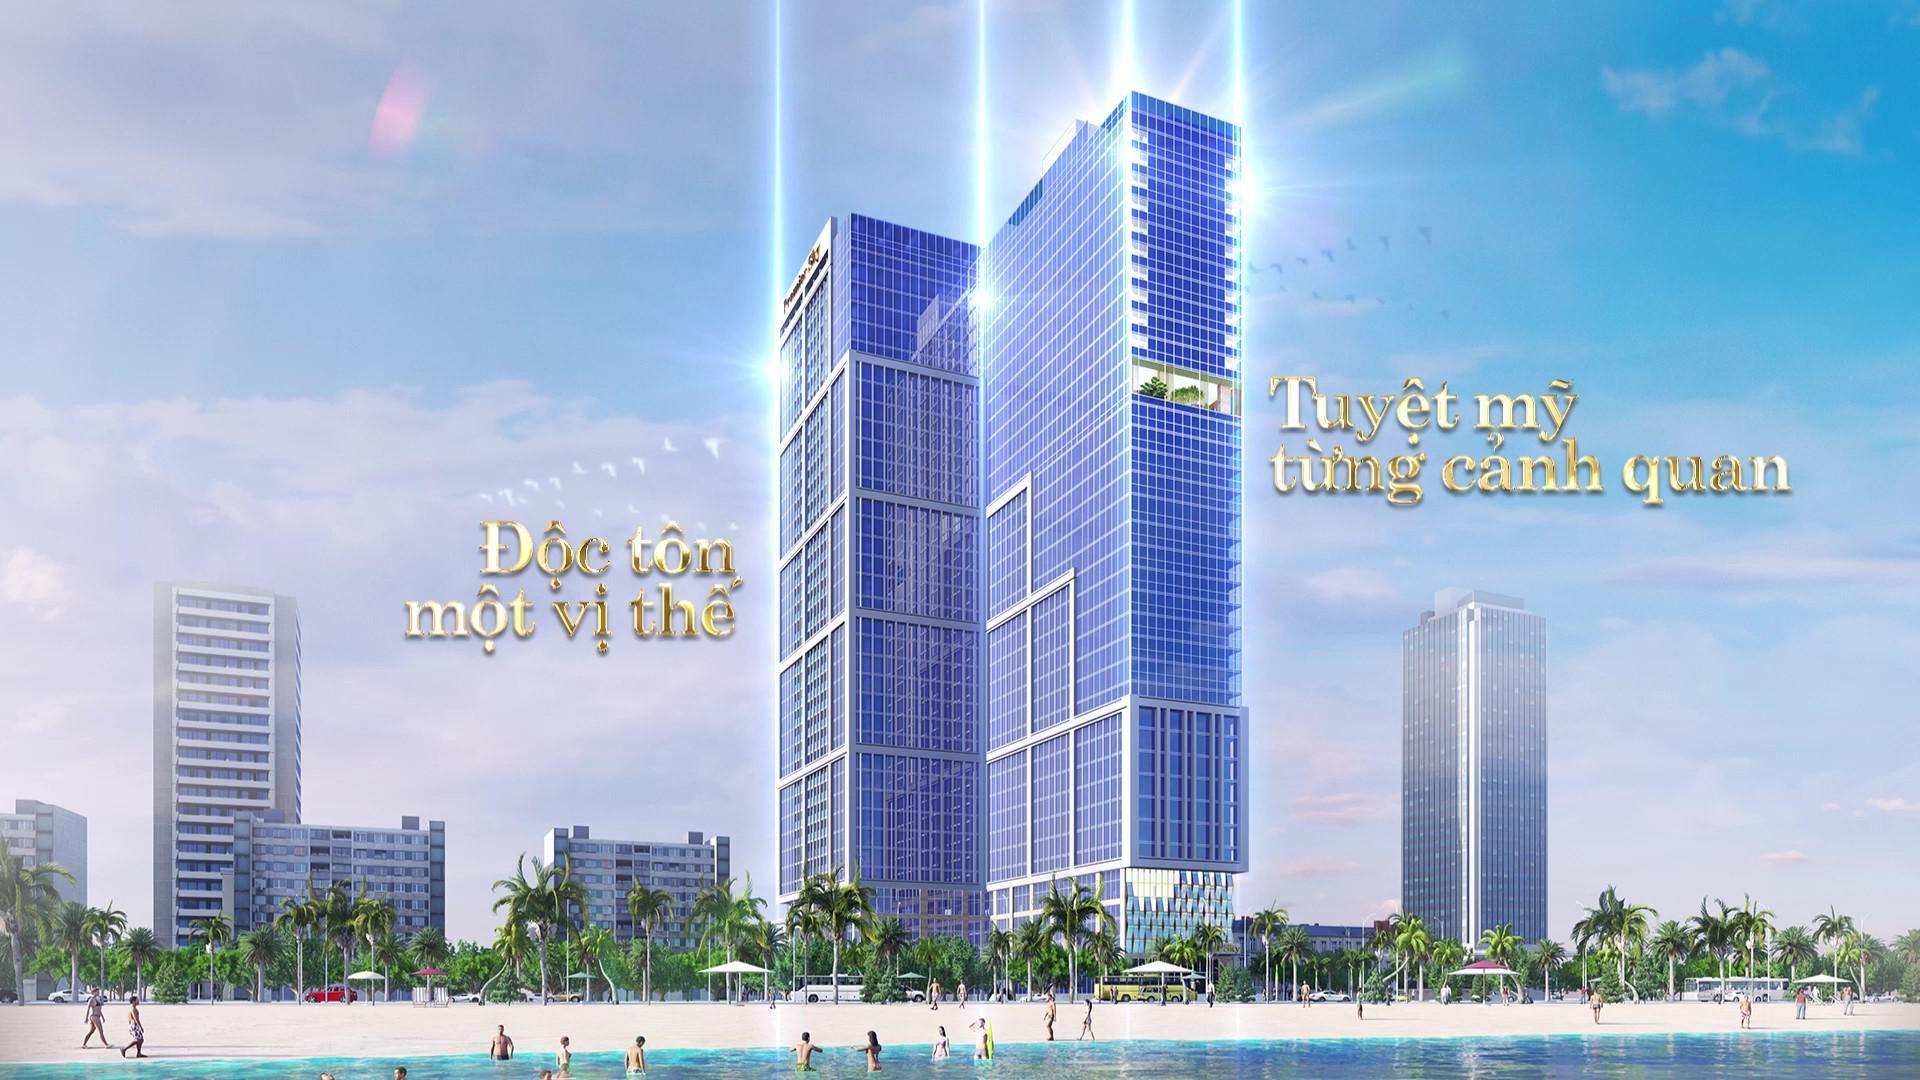 Premier Sky Residences da nang 02 - DỰ ÁN CĂN HỘ PREMIER SKY RESIDENCES ĐÀ NẴNG